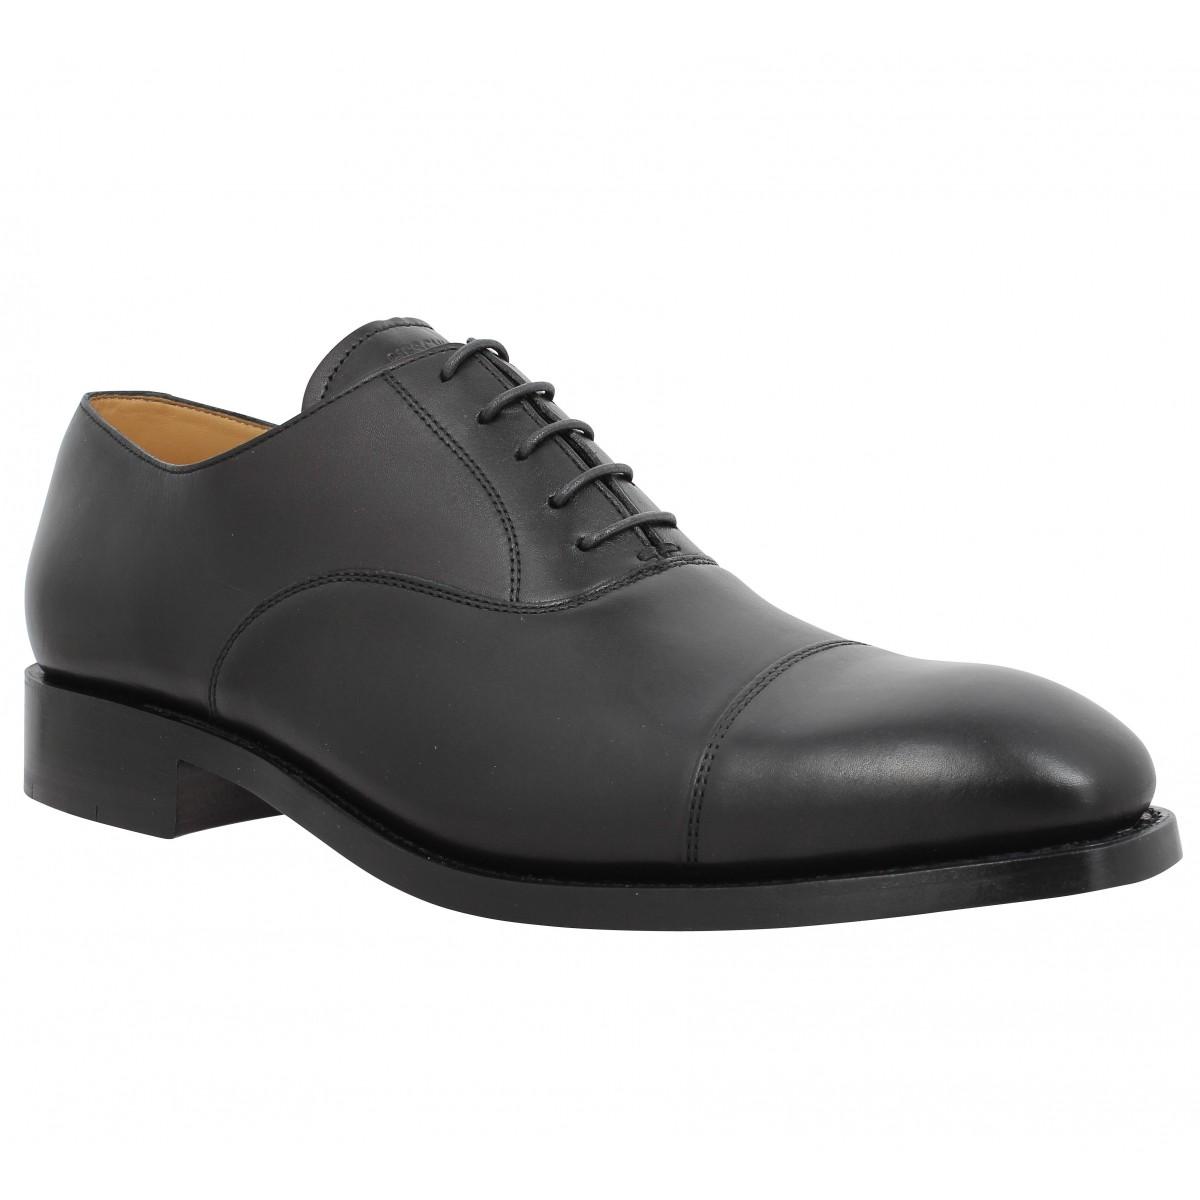 Chaussures à lacets HESCHUNG Tilleul cuir Homme Noir